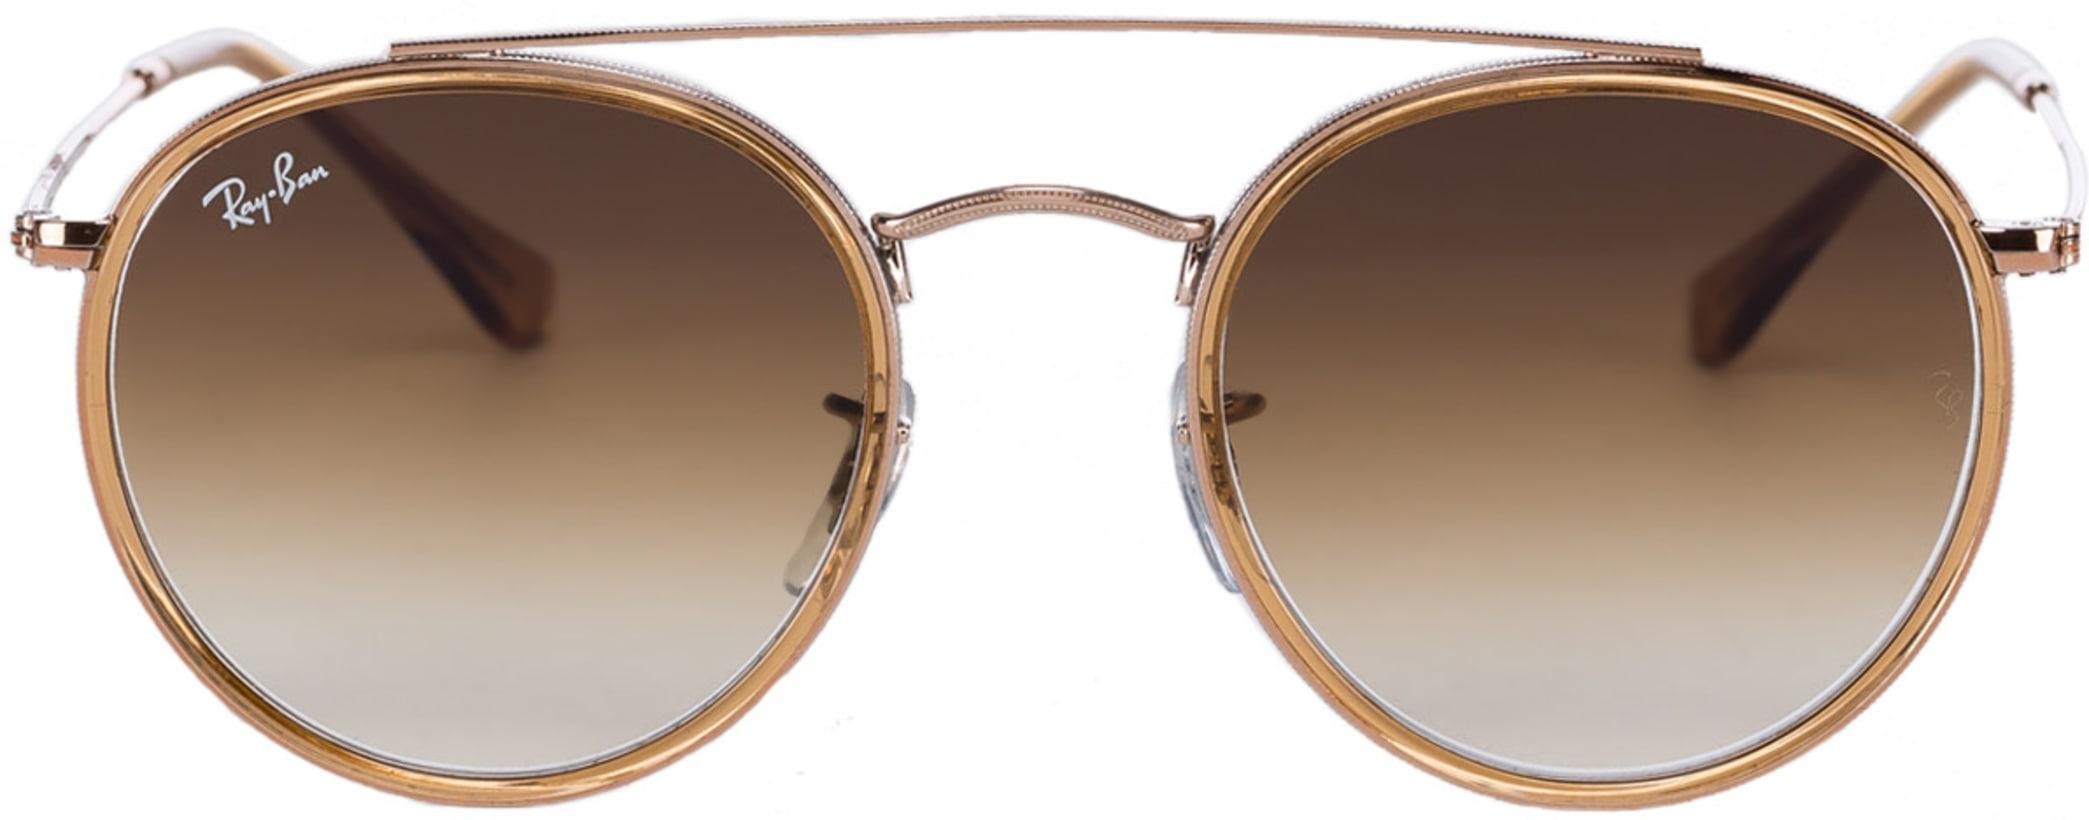 d5aaa07ec0 Ray-Ban. Round Double Bridge Sunglasses - Light Brown Bronze Copper Light  Brown Gradient